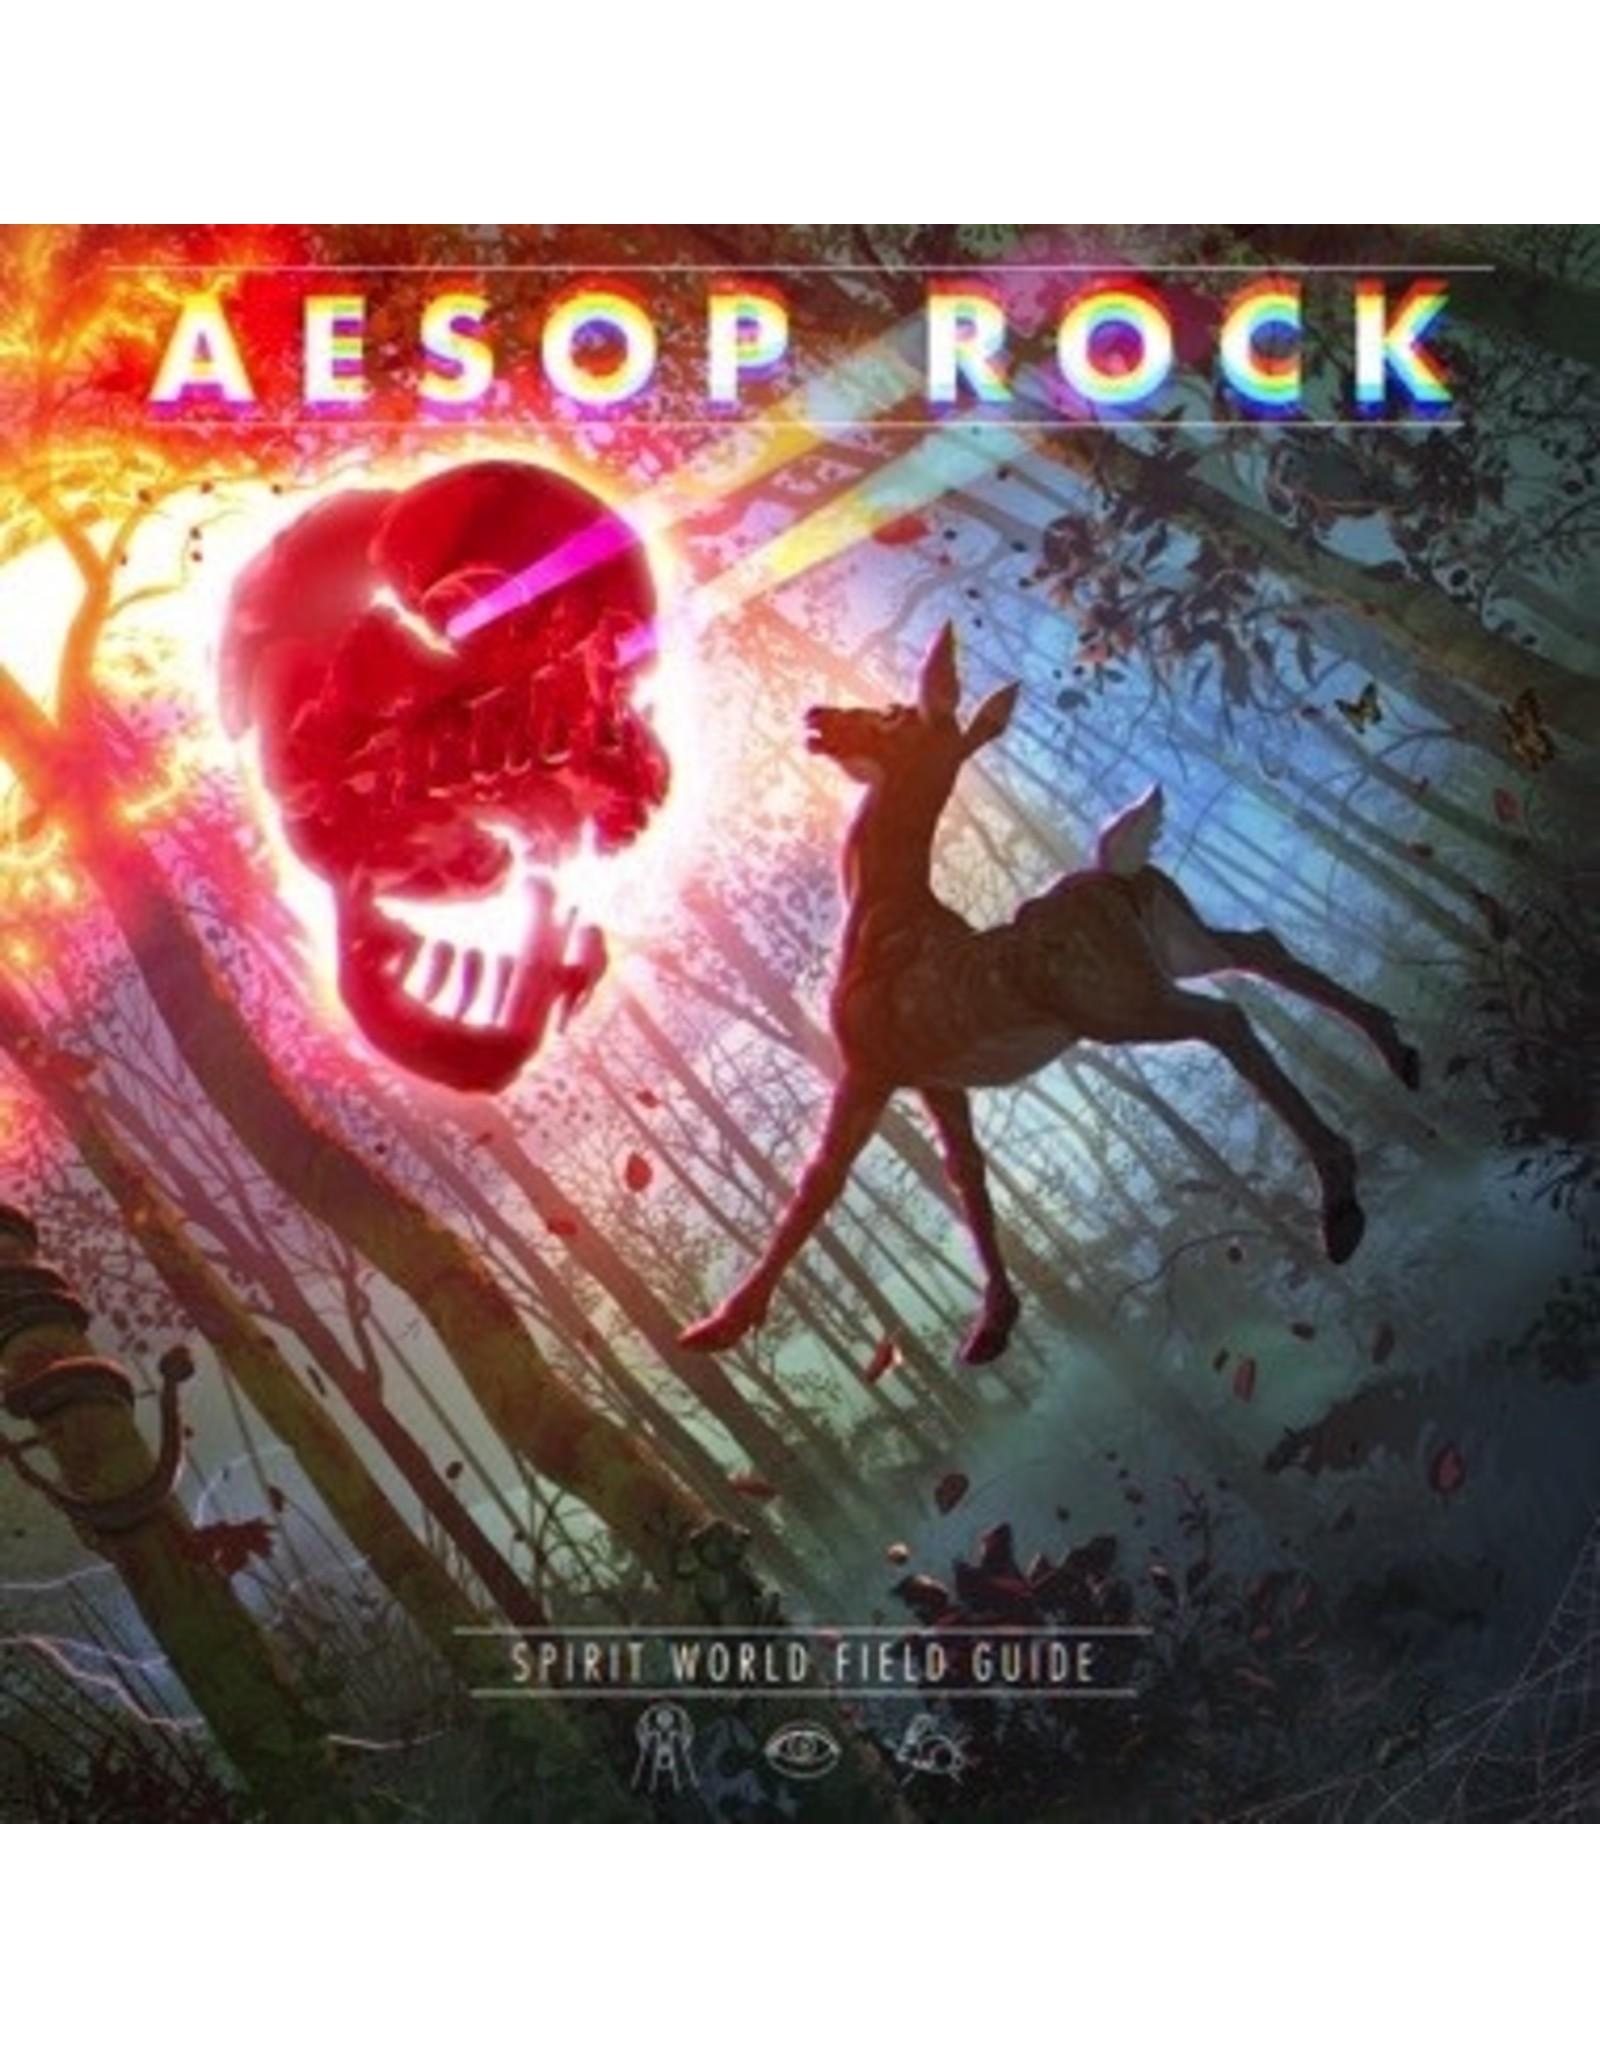 New Vinyl Aesop Rock - Spirit World Field Guide (Clear) 2LP